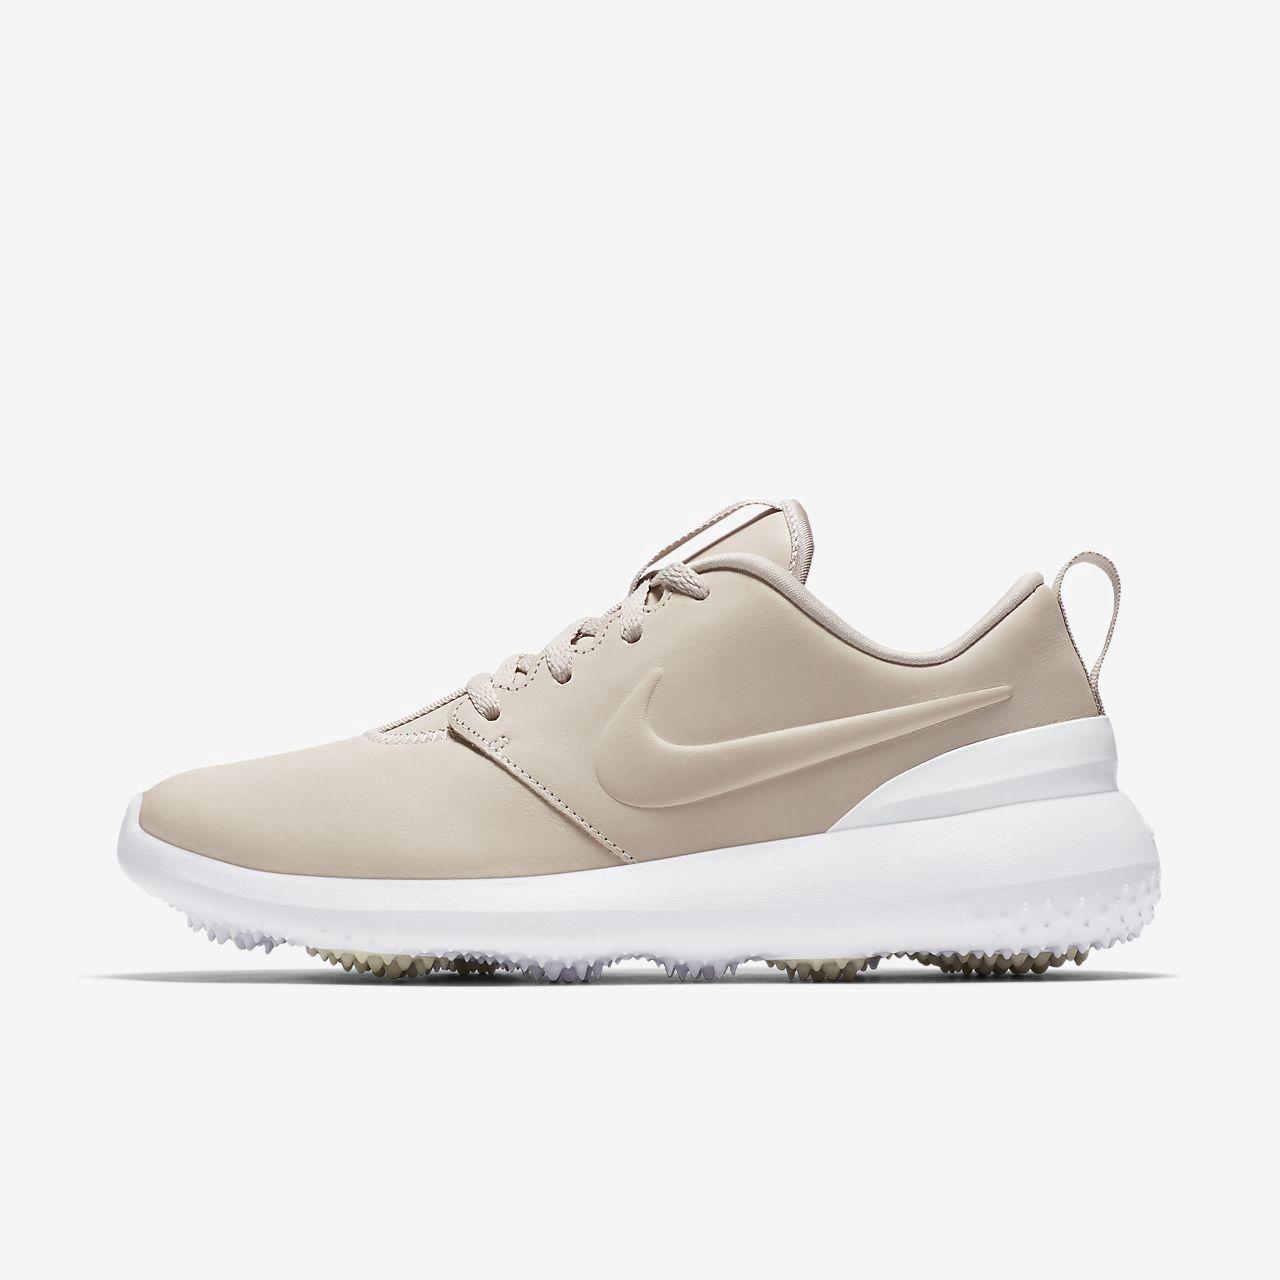 reputable site 70cb9 932d2 Nike Roshe G Premium Women s Golf Shoe - 7